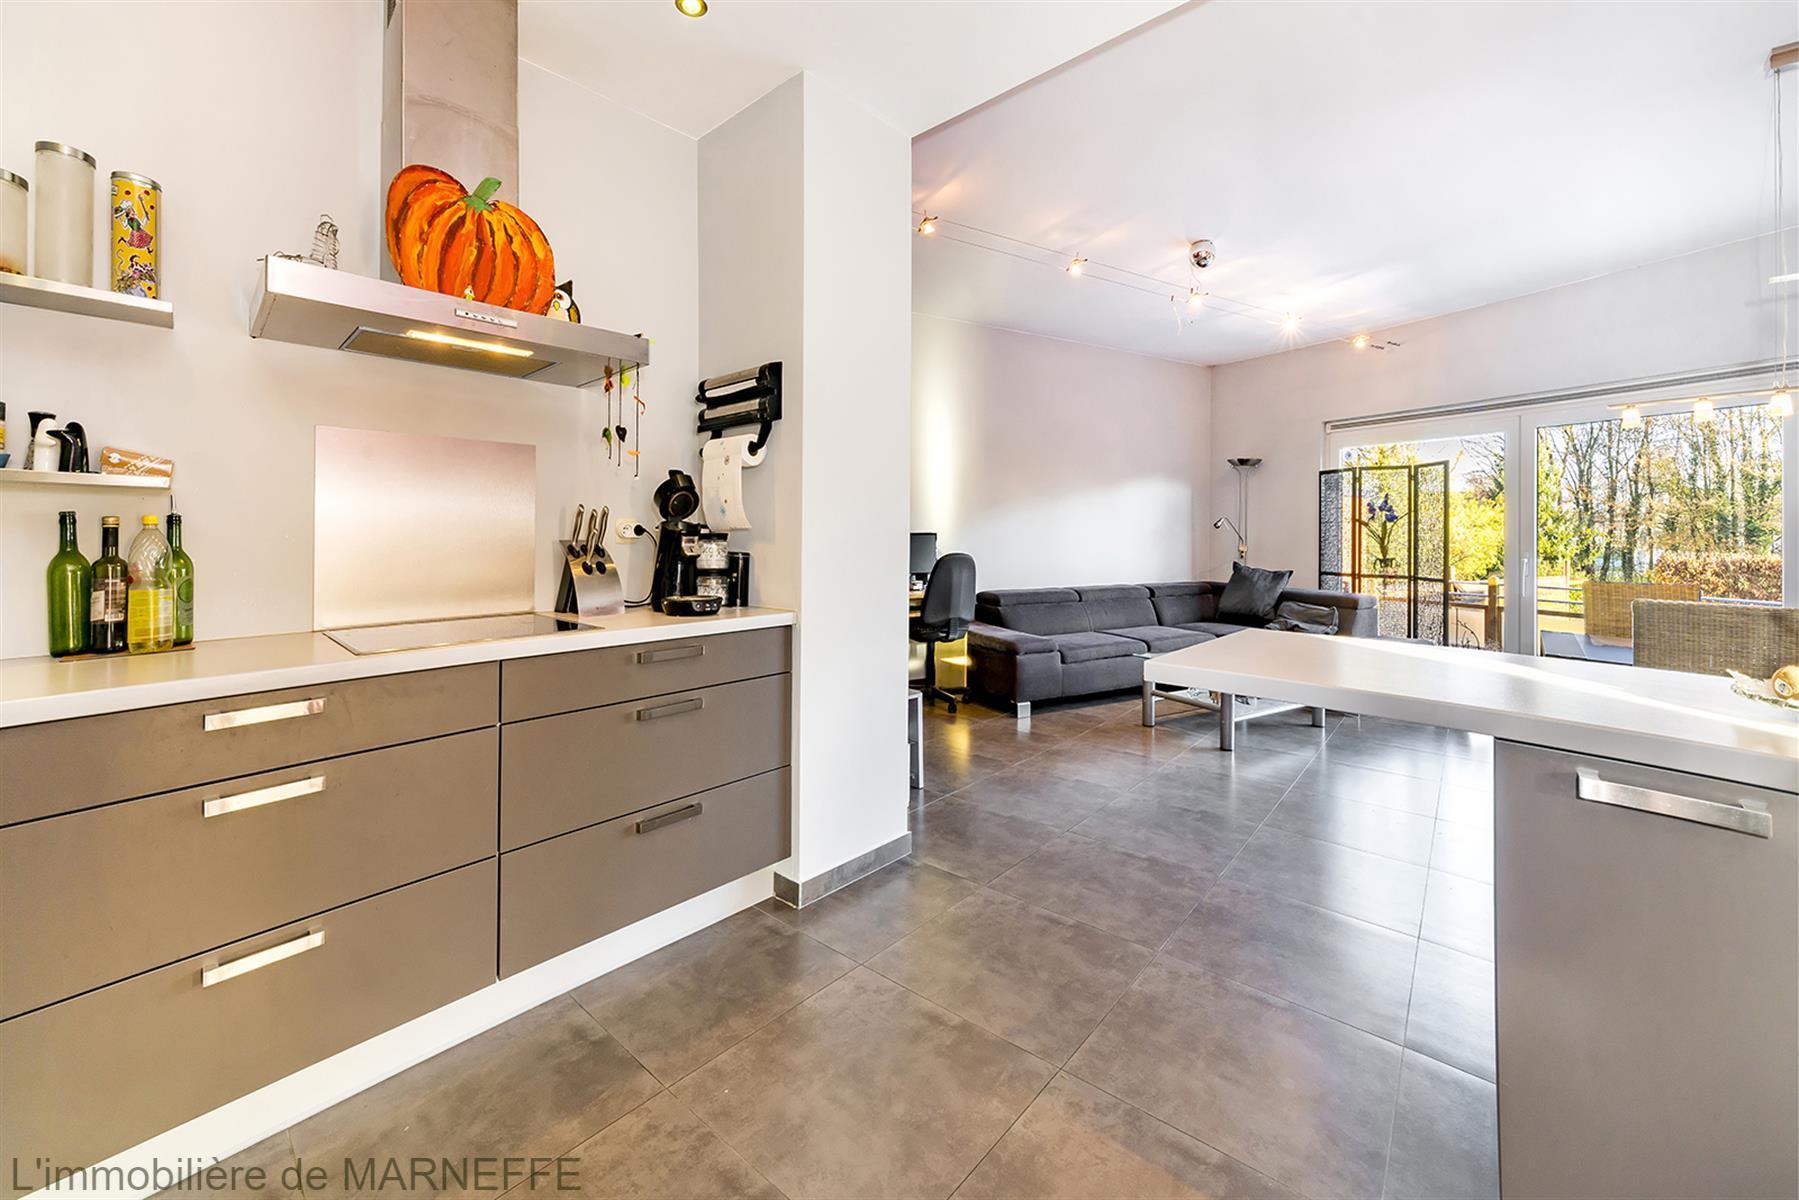 Appartement avec jardin - Orp-Jauche - #3625402-6